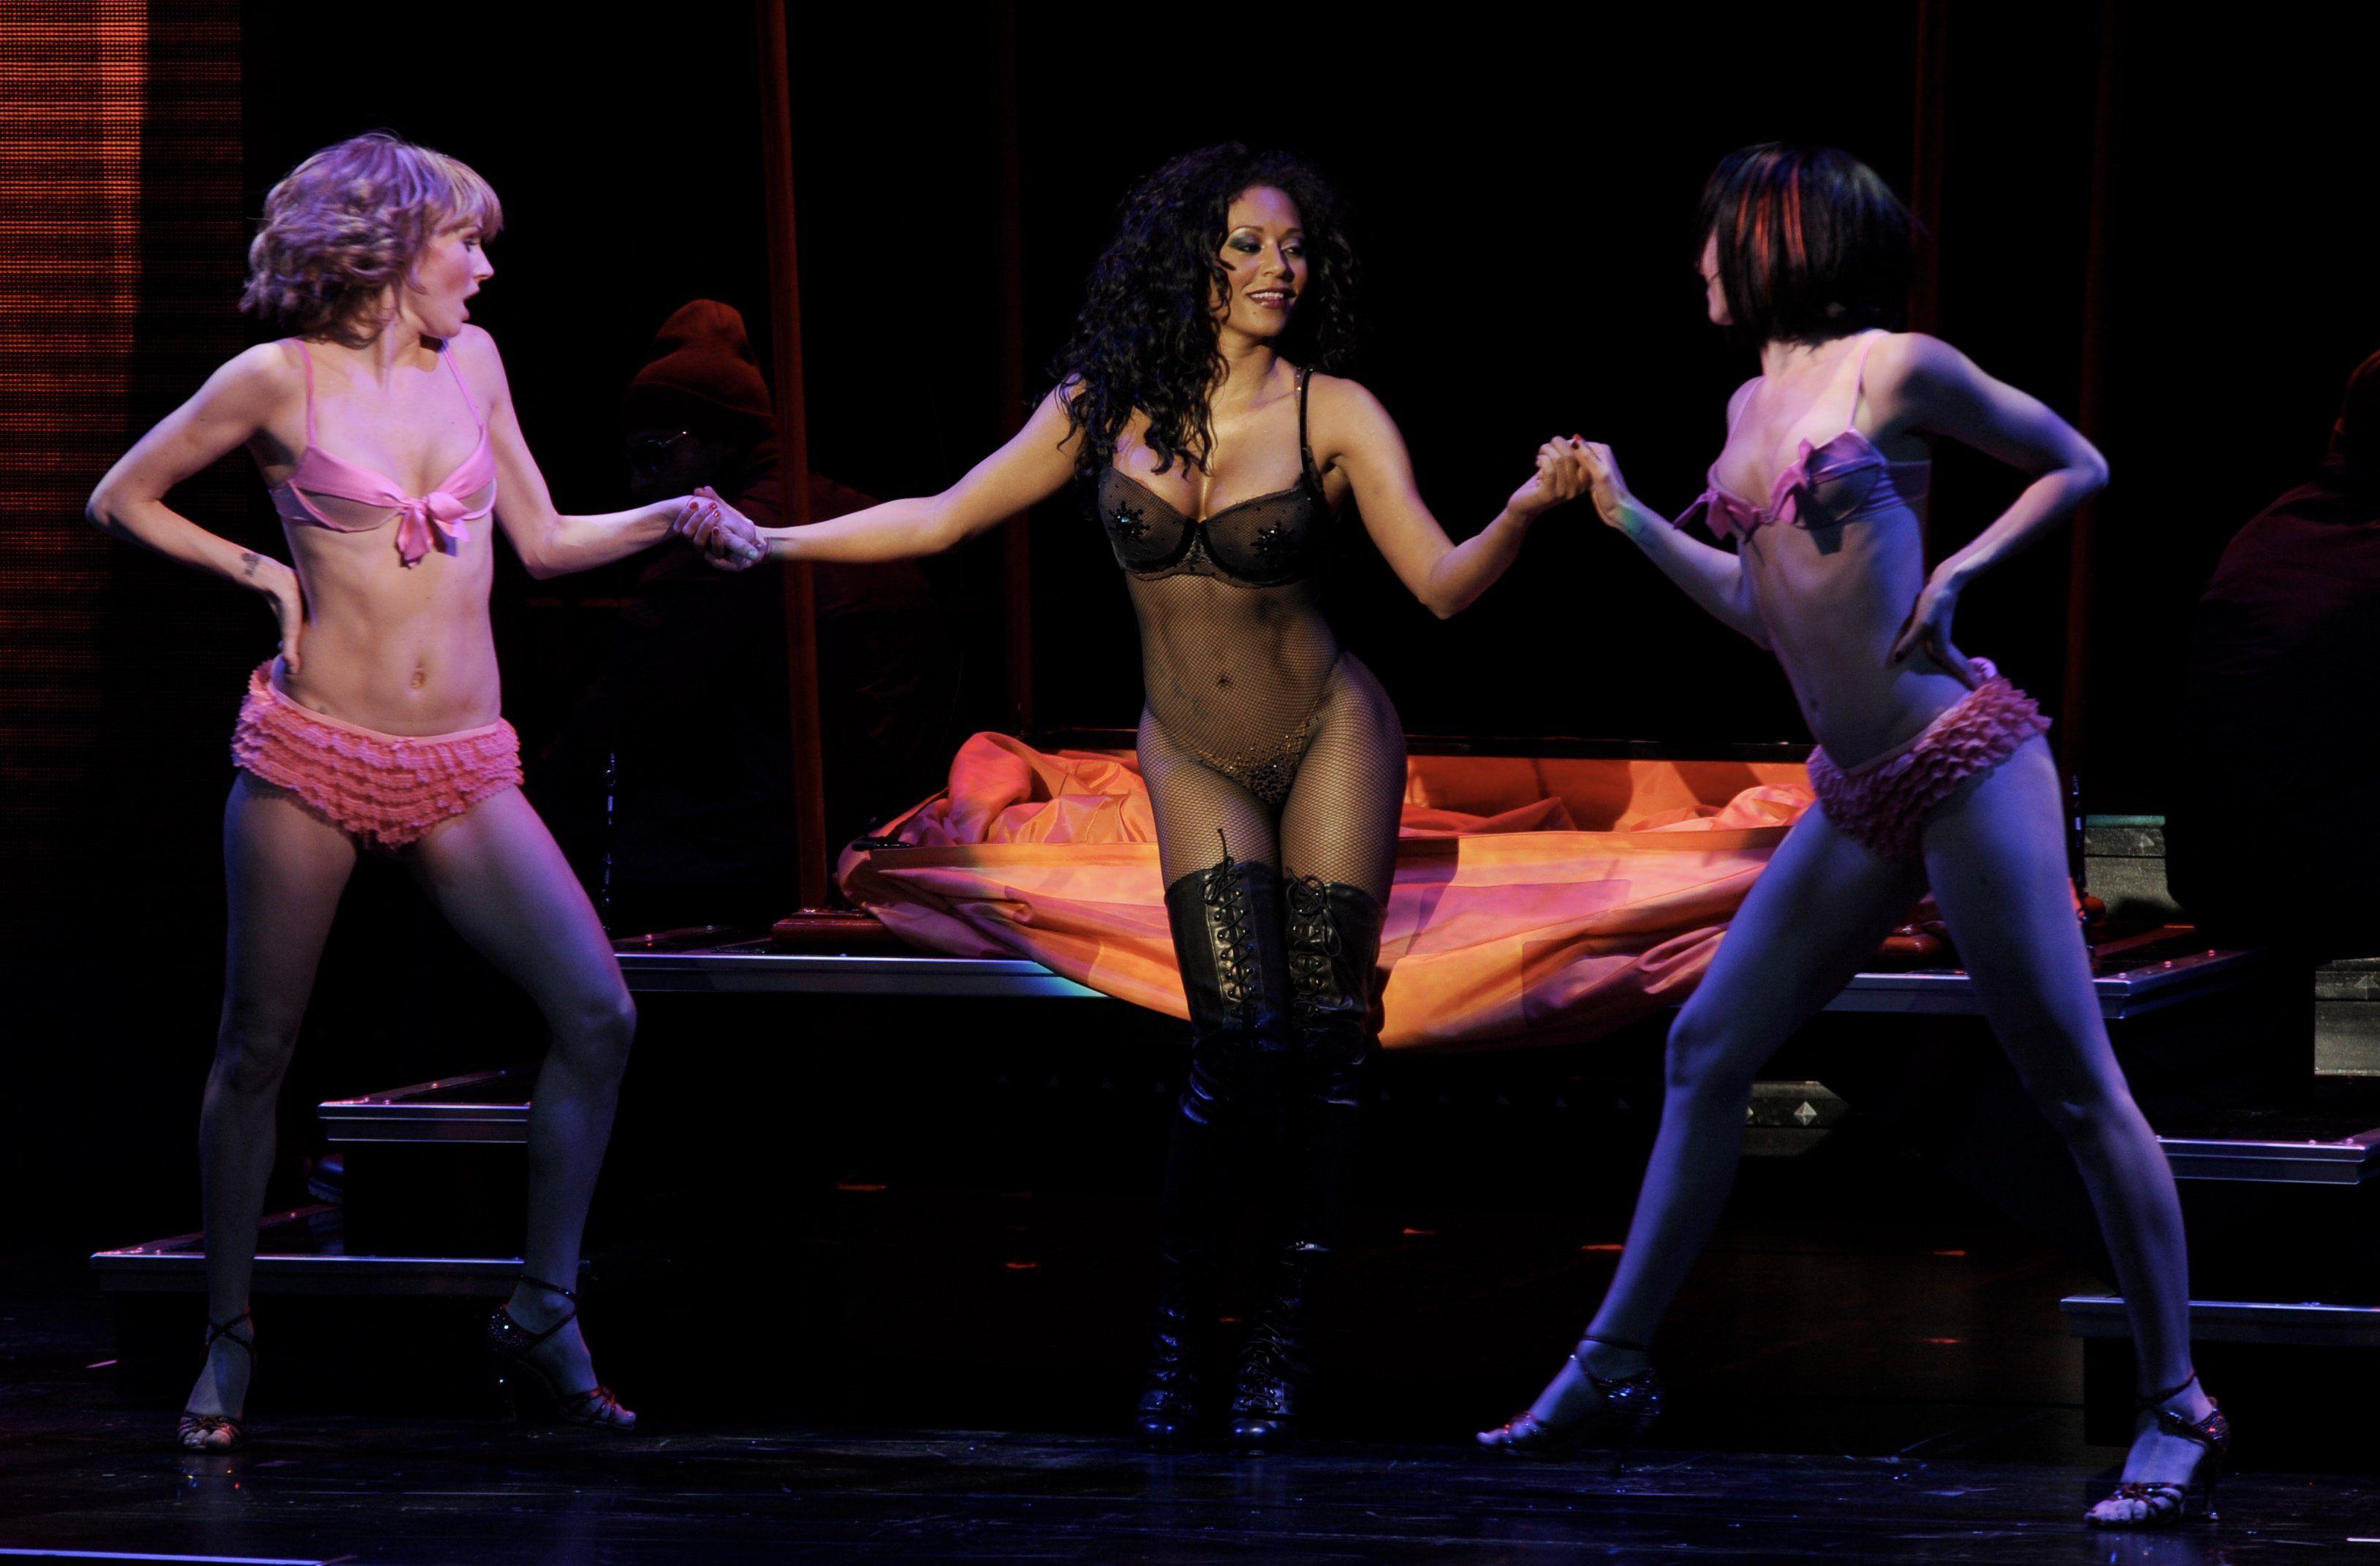 Girls at a strip show